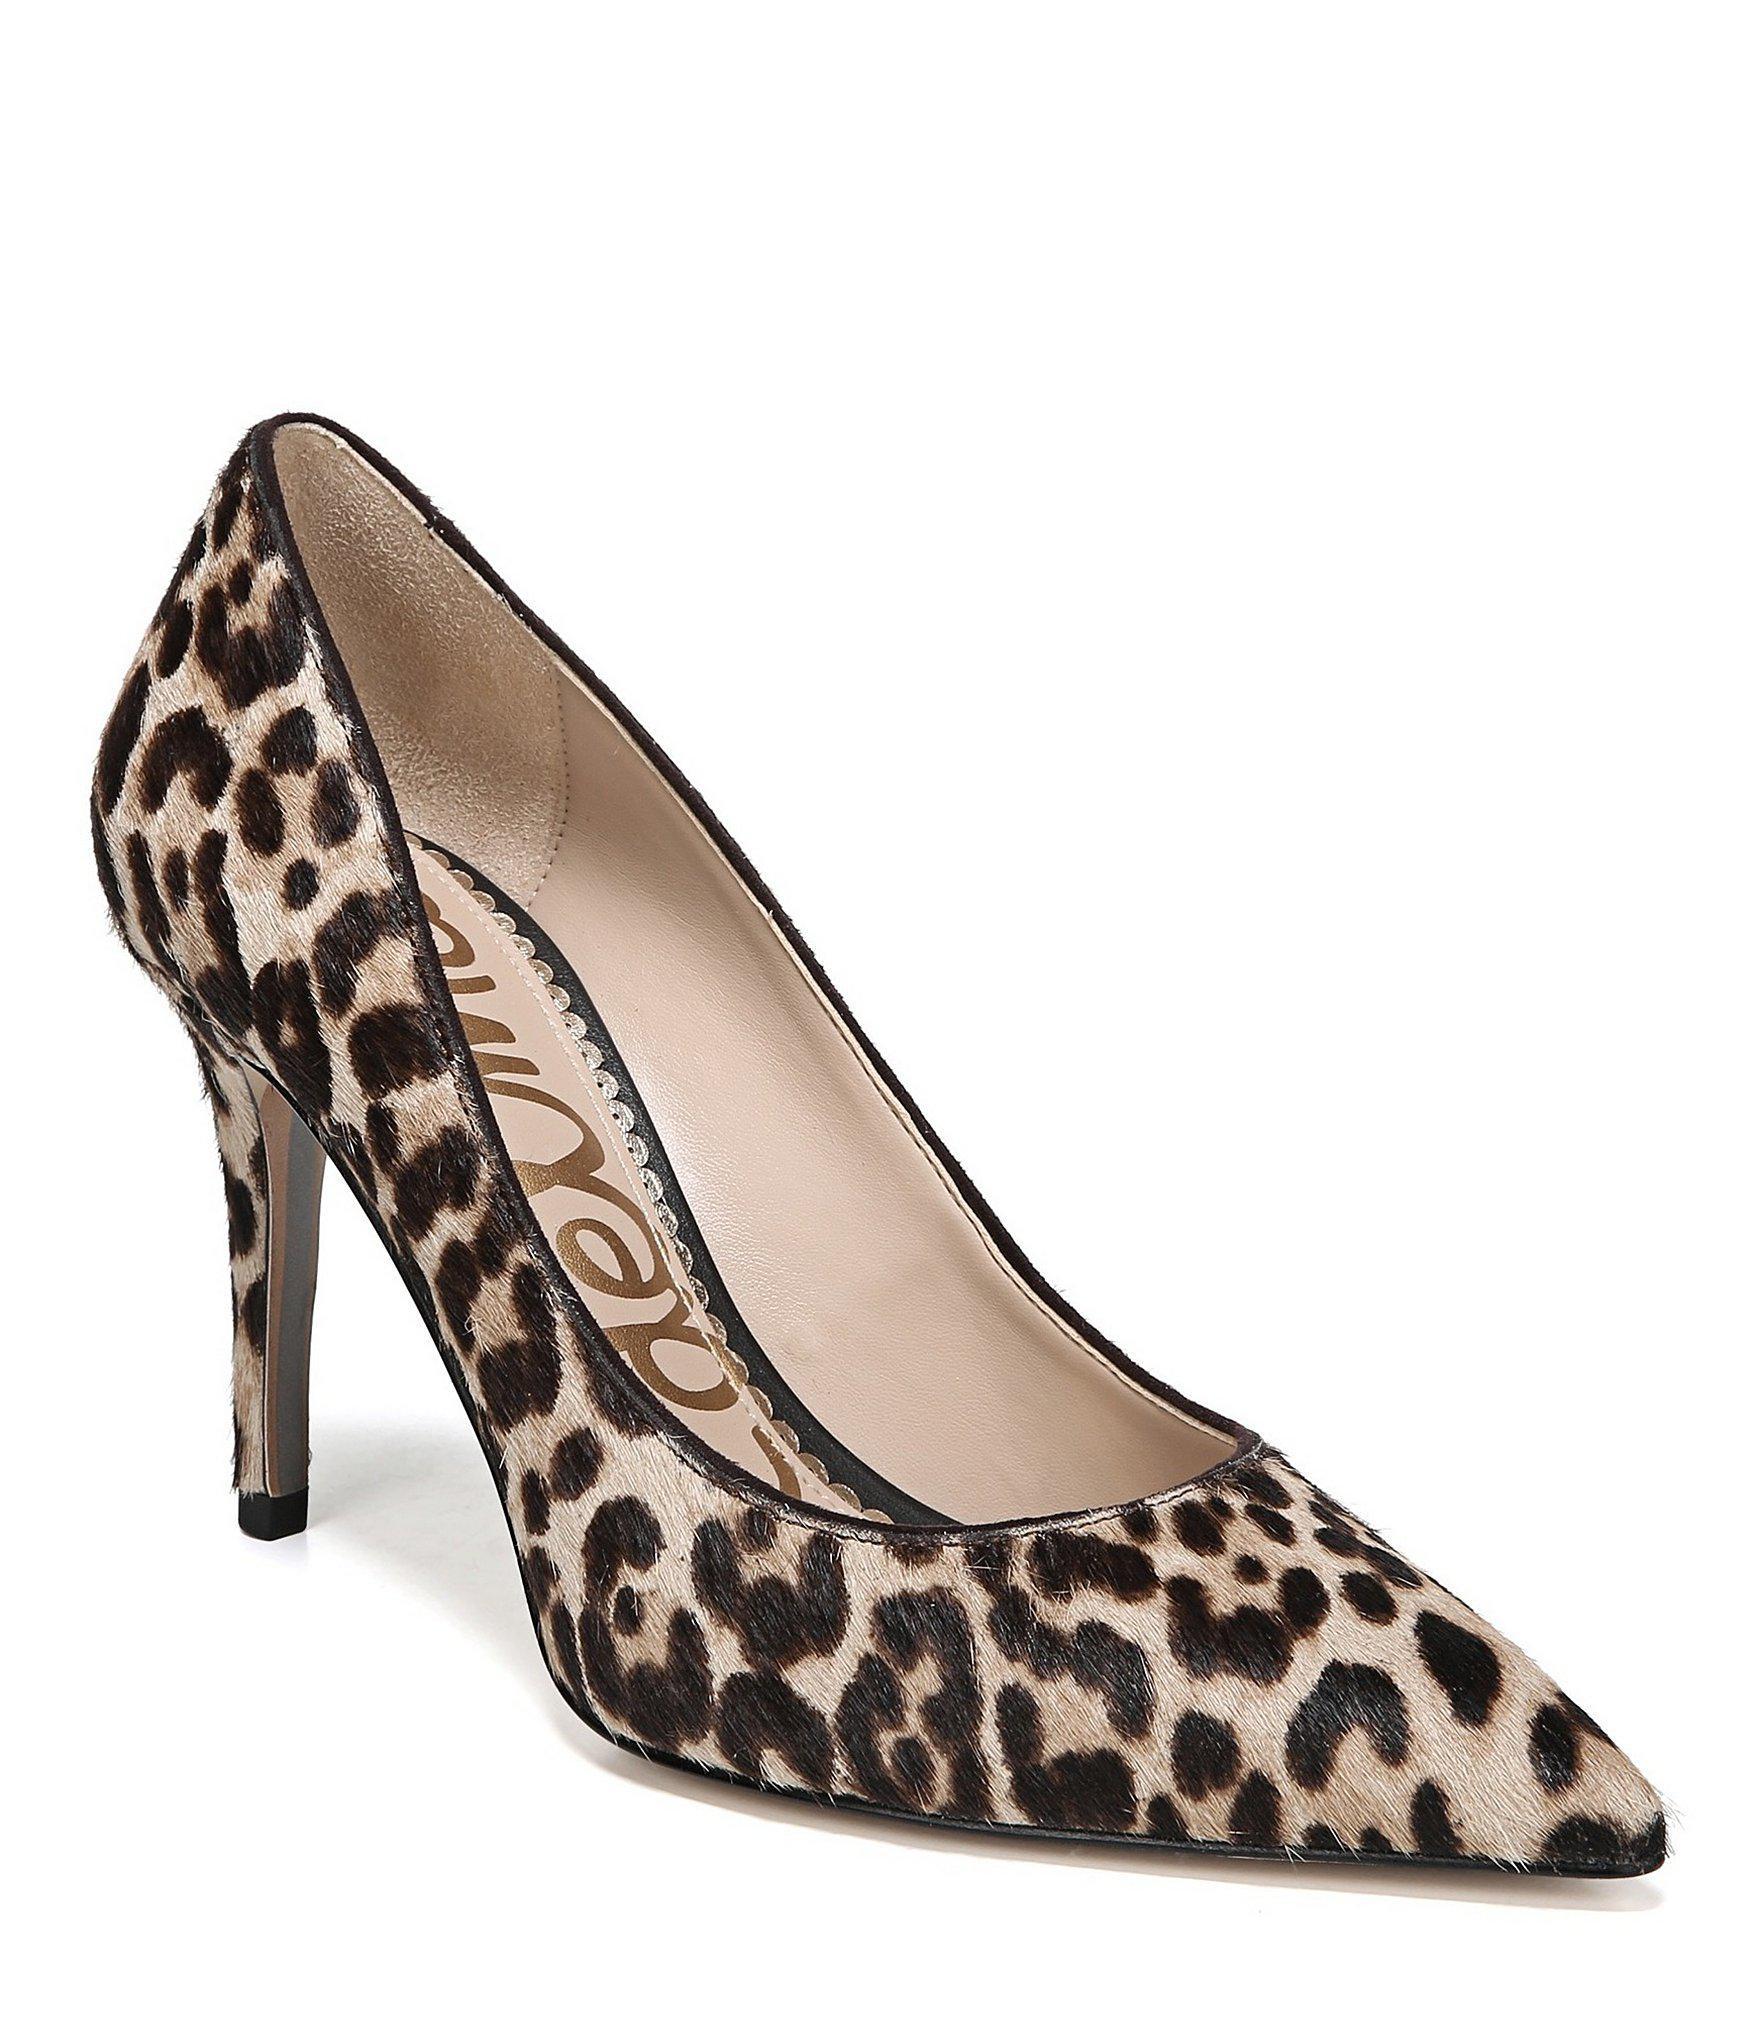 06f4870ef2 Lyst - Sam Edelman Margie Leopard Printed Dress Pumps